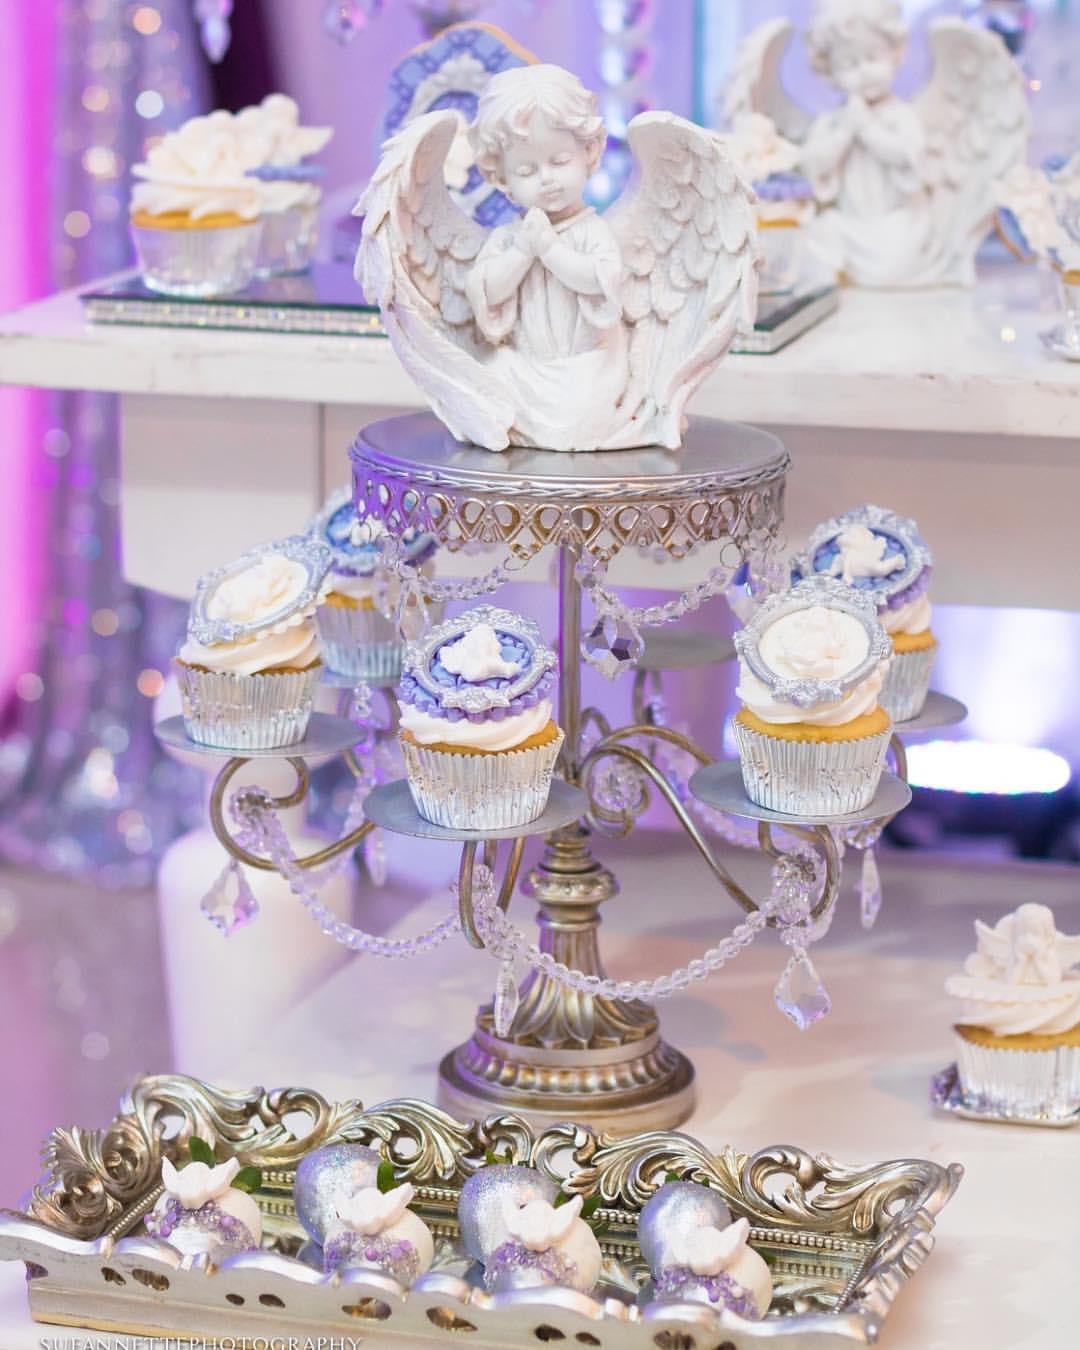 Silver dessert stand opulent treasures angel heaven sent baby shower graces events.jpg